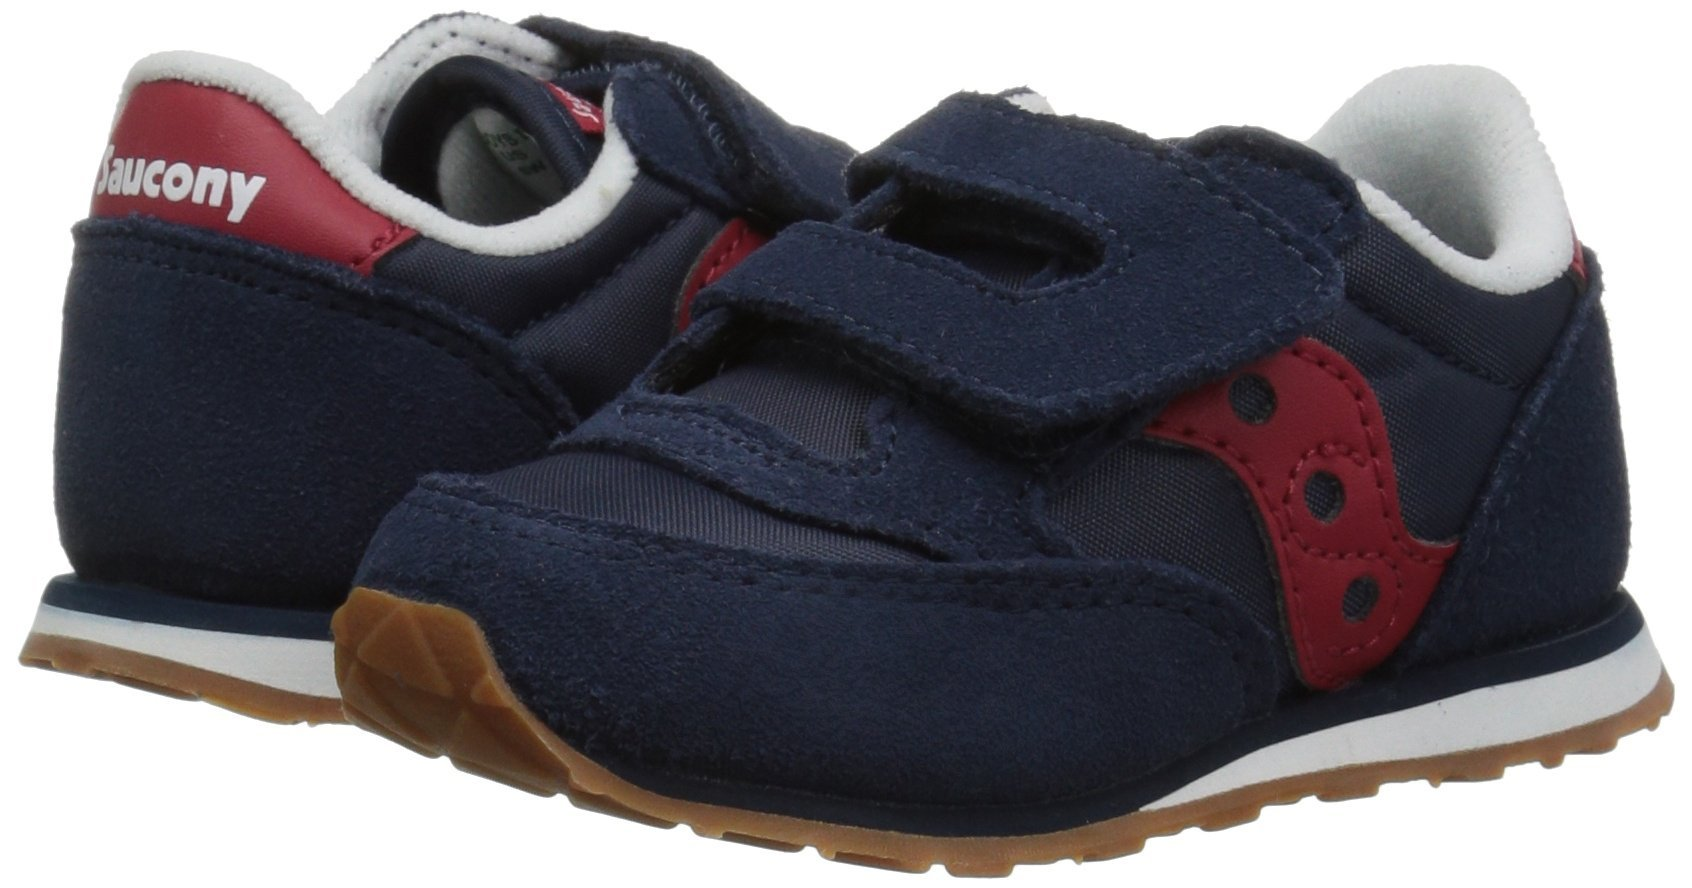 Saucony Jazz Hook & Loop Sneaker (Toddler/Little Kid), Navy/Red, 12 M US Little Kid by Saucony (Image #6)